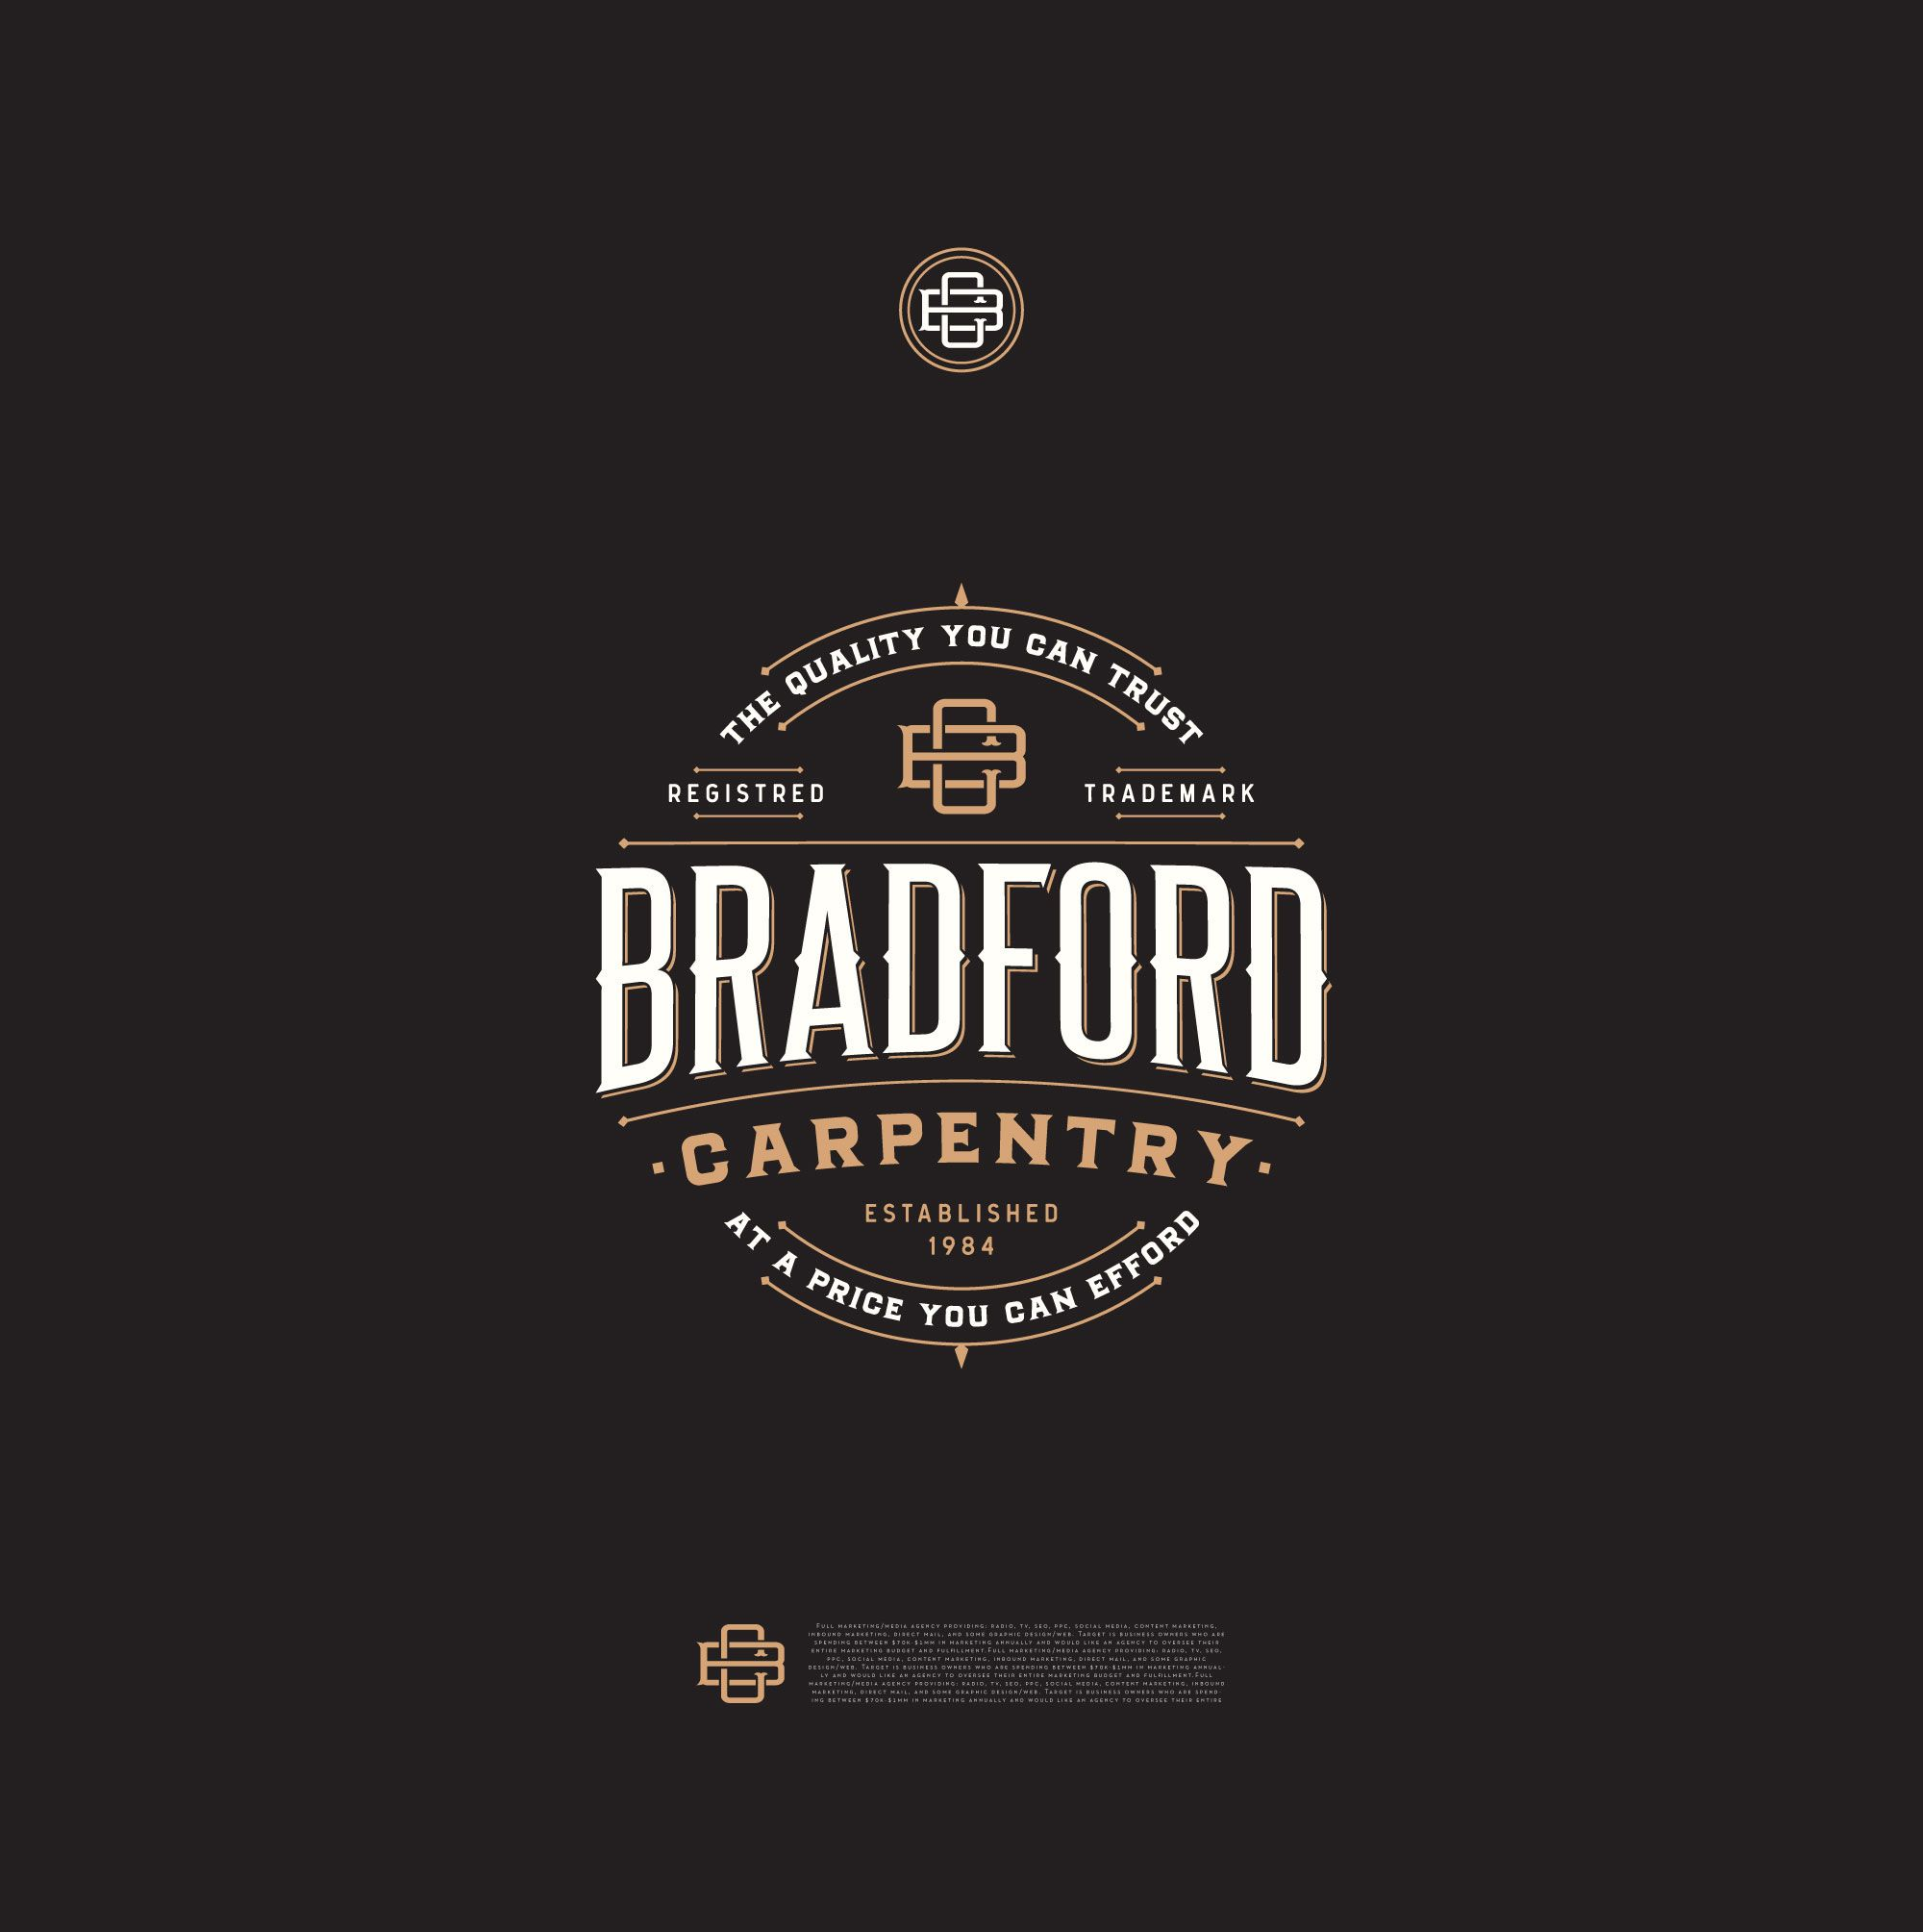 Bradford Carpentry - Logo | /LET/ | Pinterest | Carpentry, Logos ...